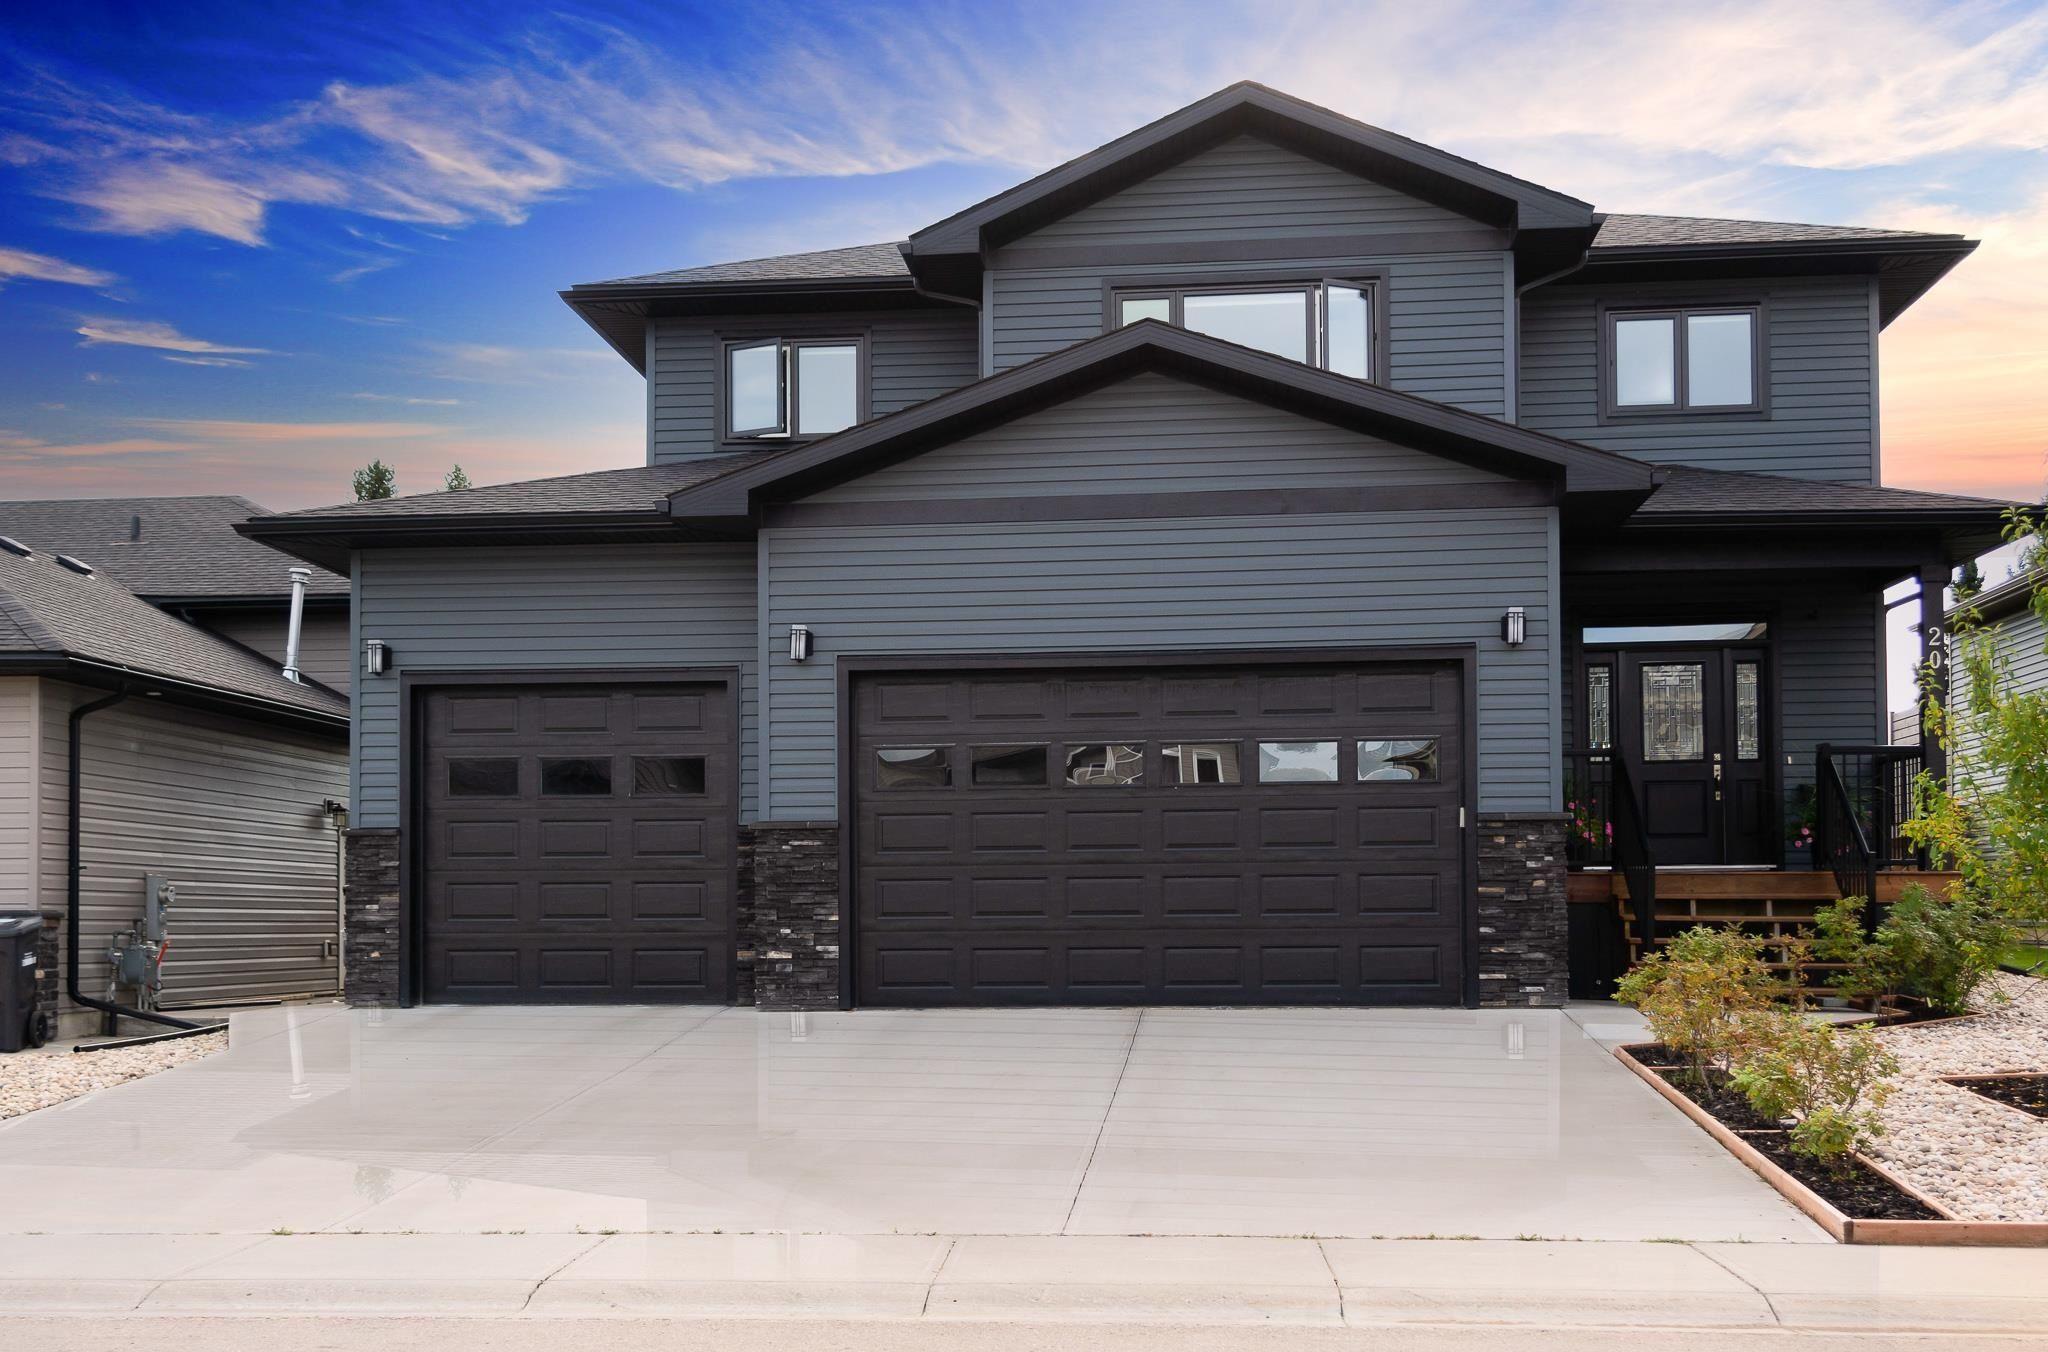 Main Photo: 20 FALCON Road: Cold Lake House for sale : MLS®# E4264703